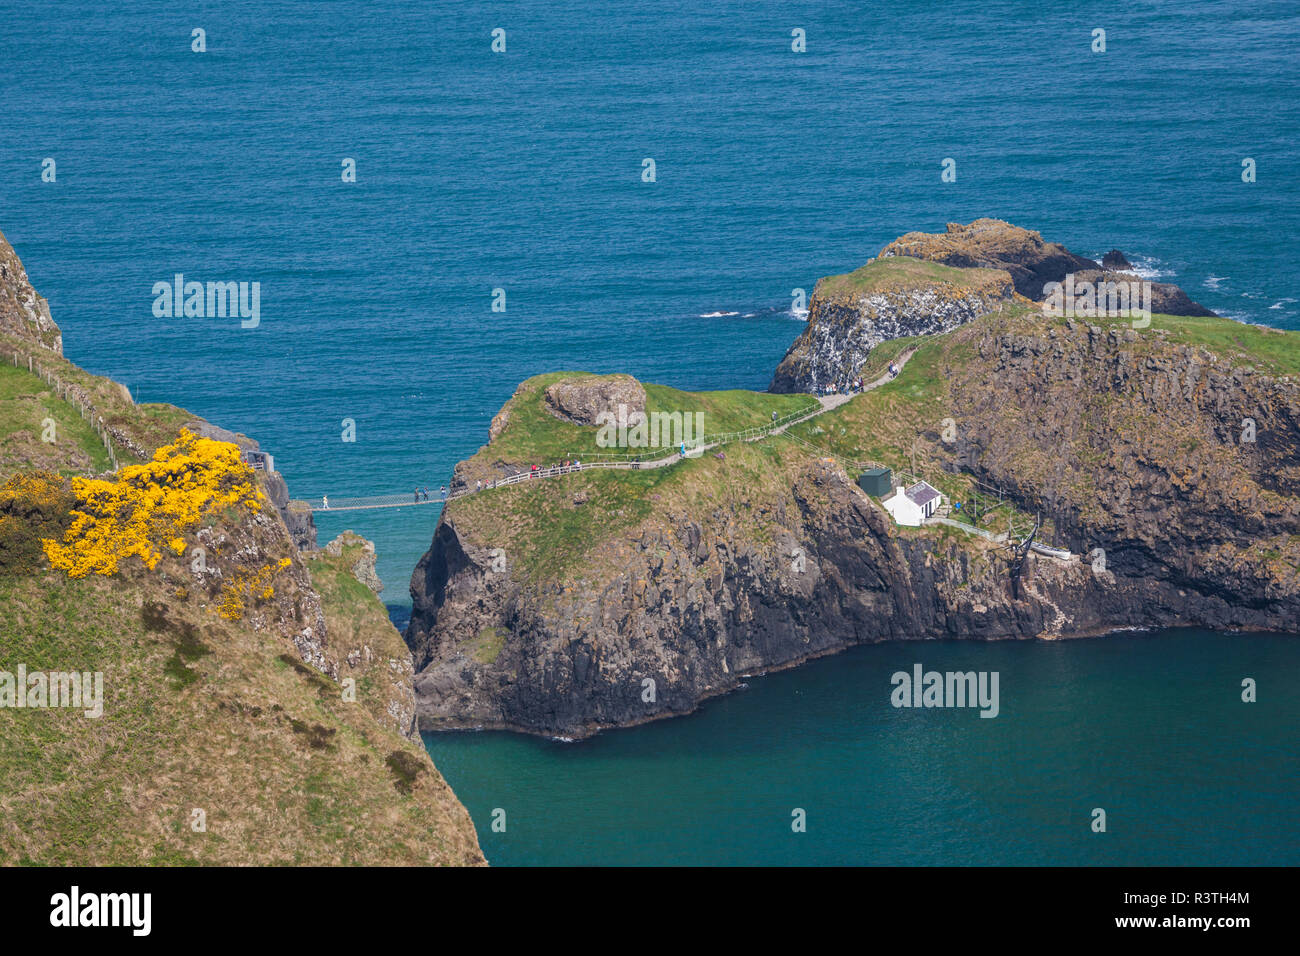 UK, Northern Ireland, County Antrim, Ballintoy, Carrick-a-Rede Rope Bridge - Stock Image